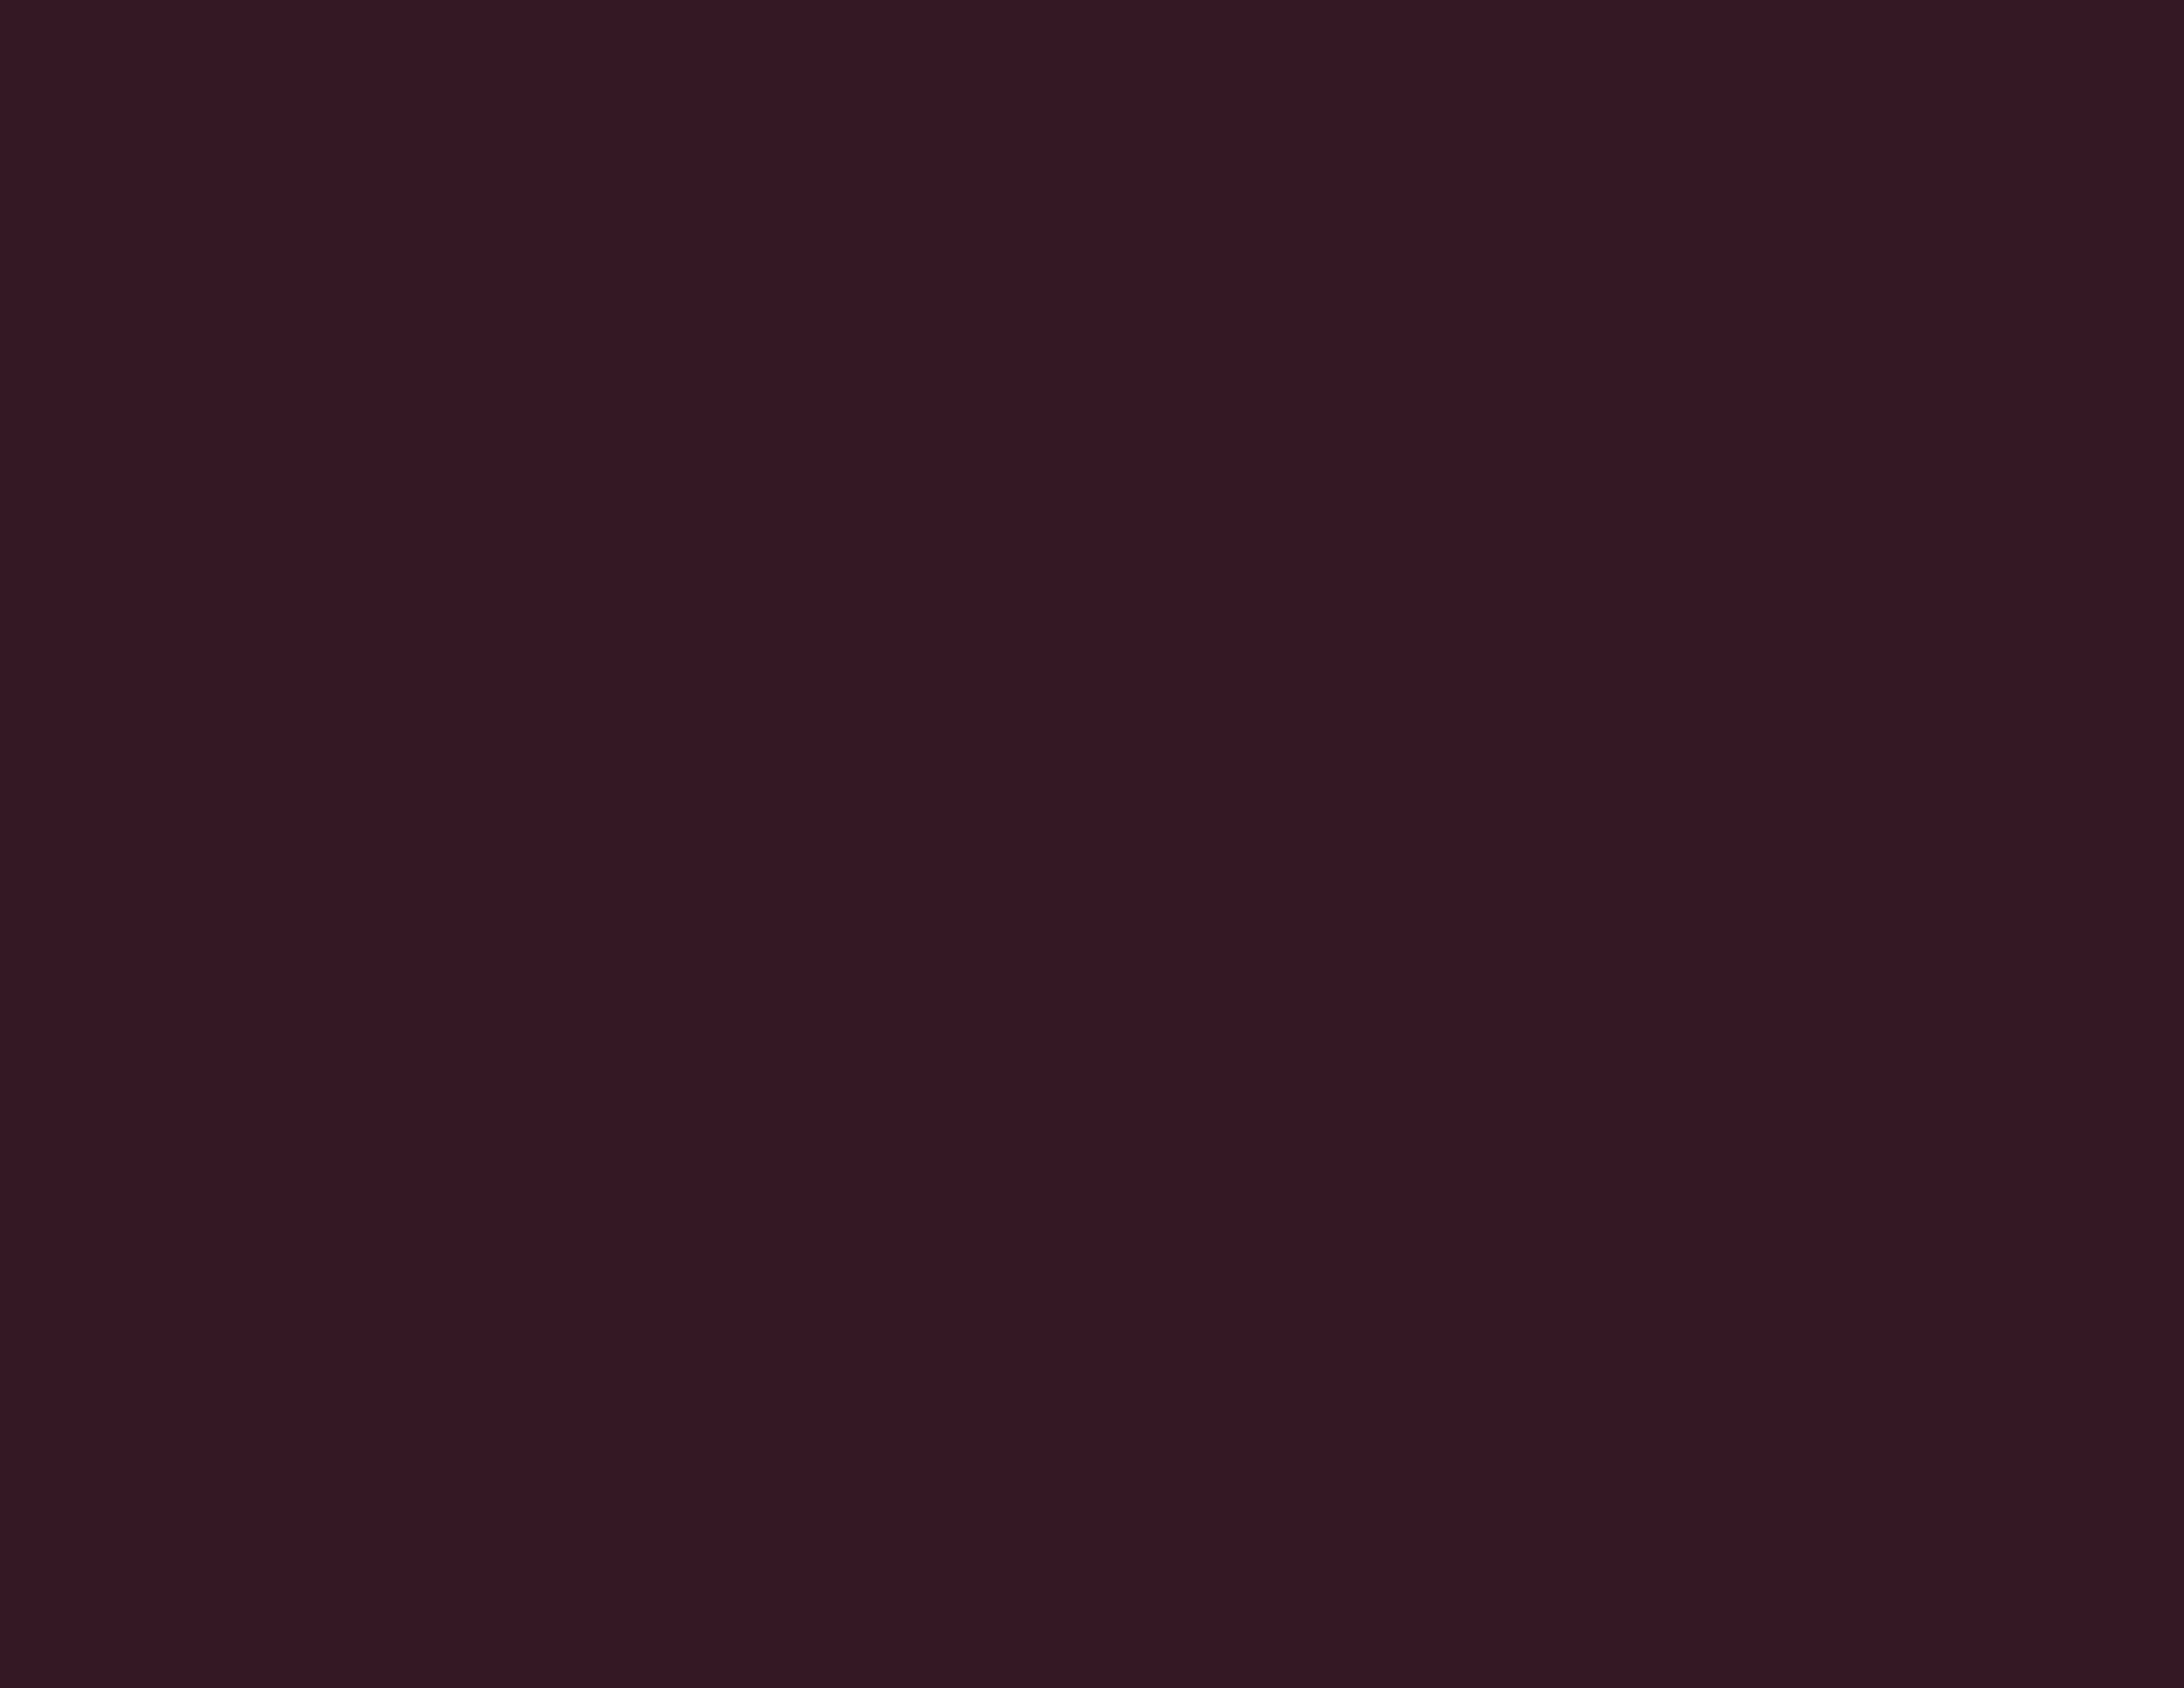 Color Palette Blocks2.jpg